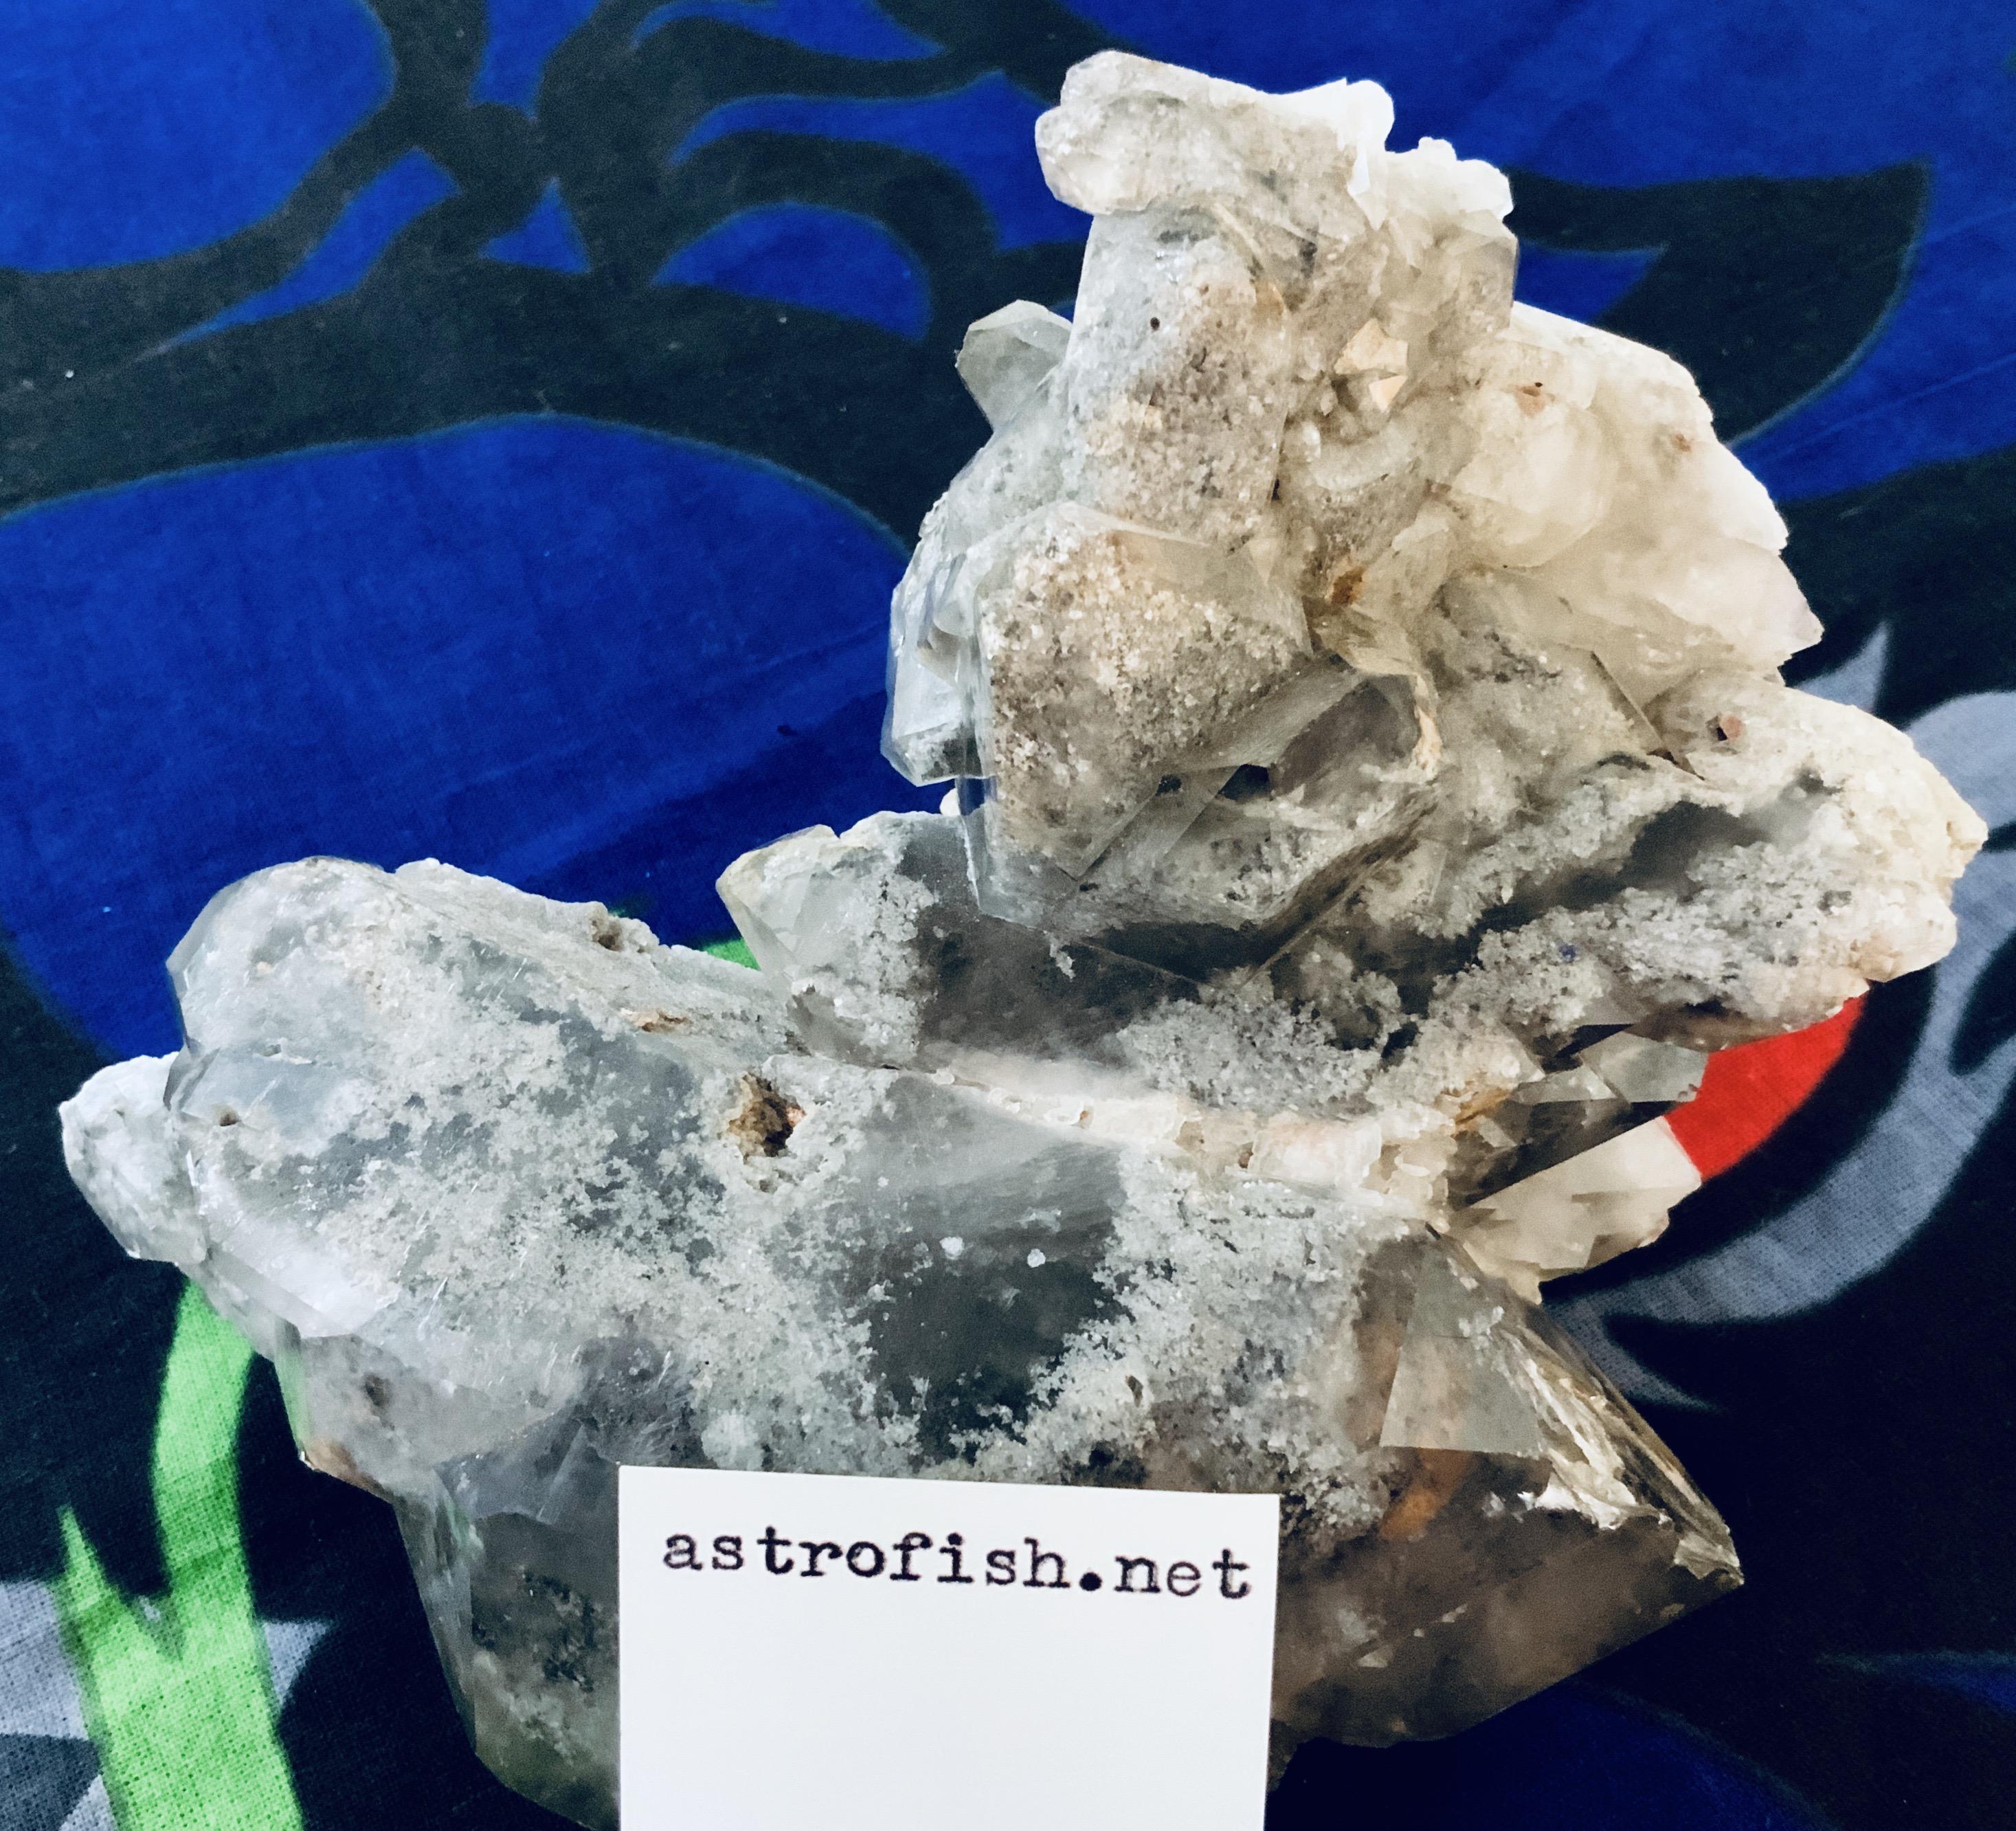 astrofish.net/travel